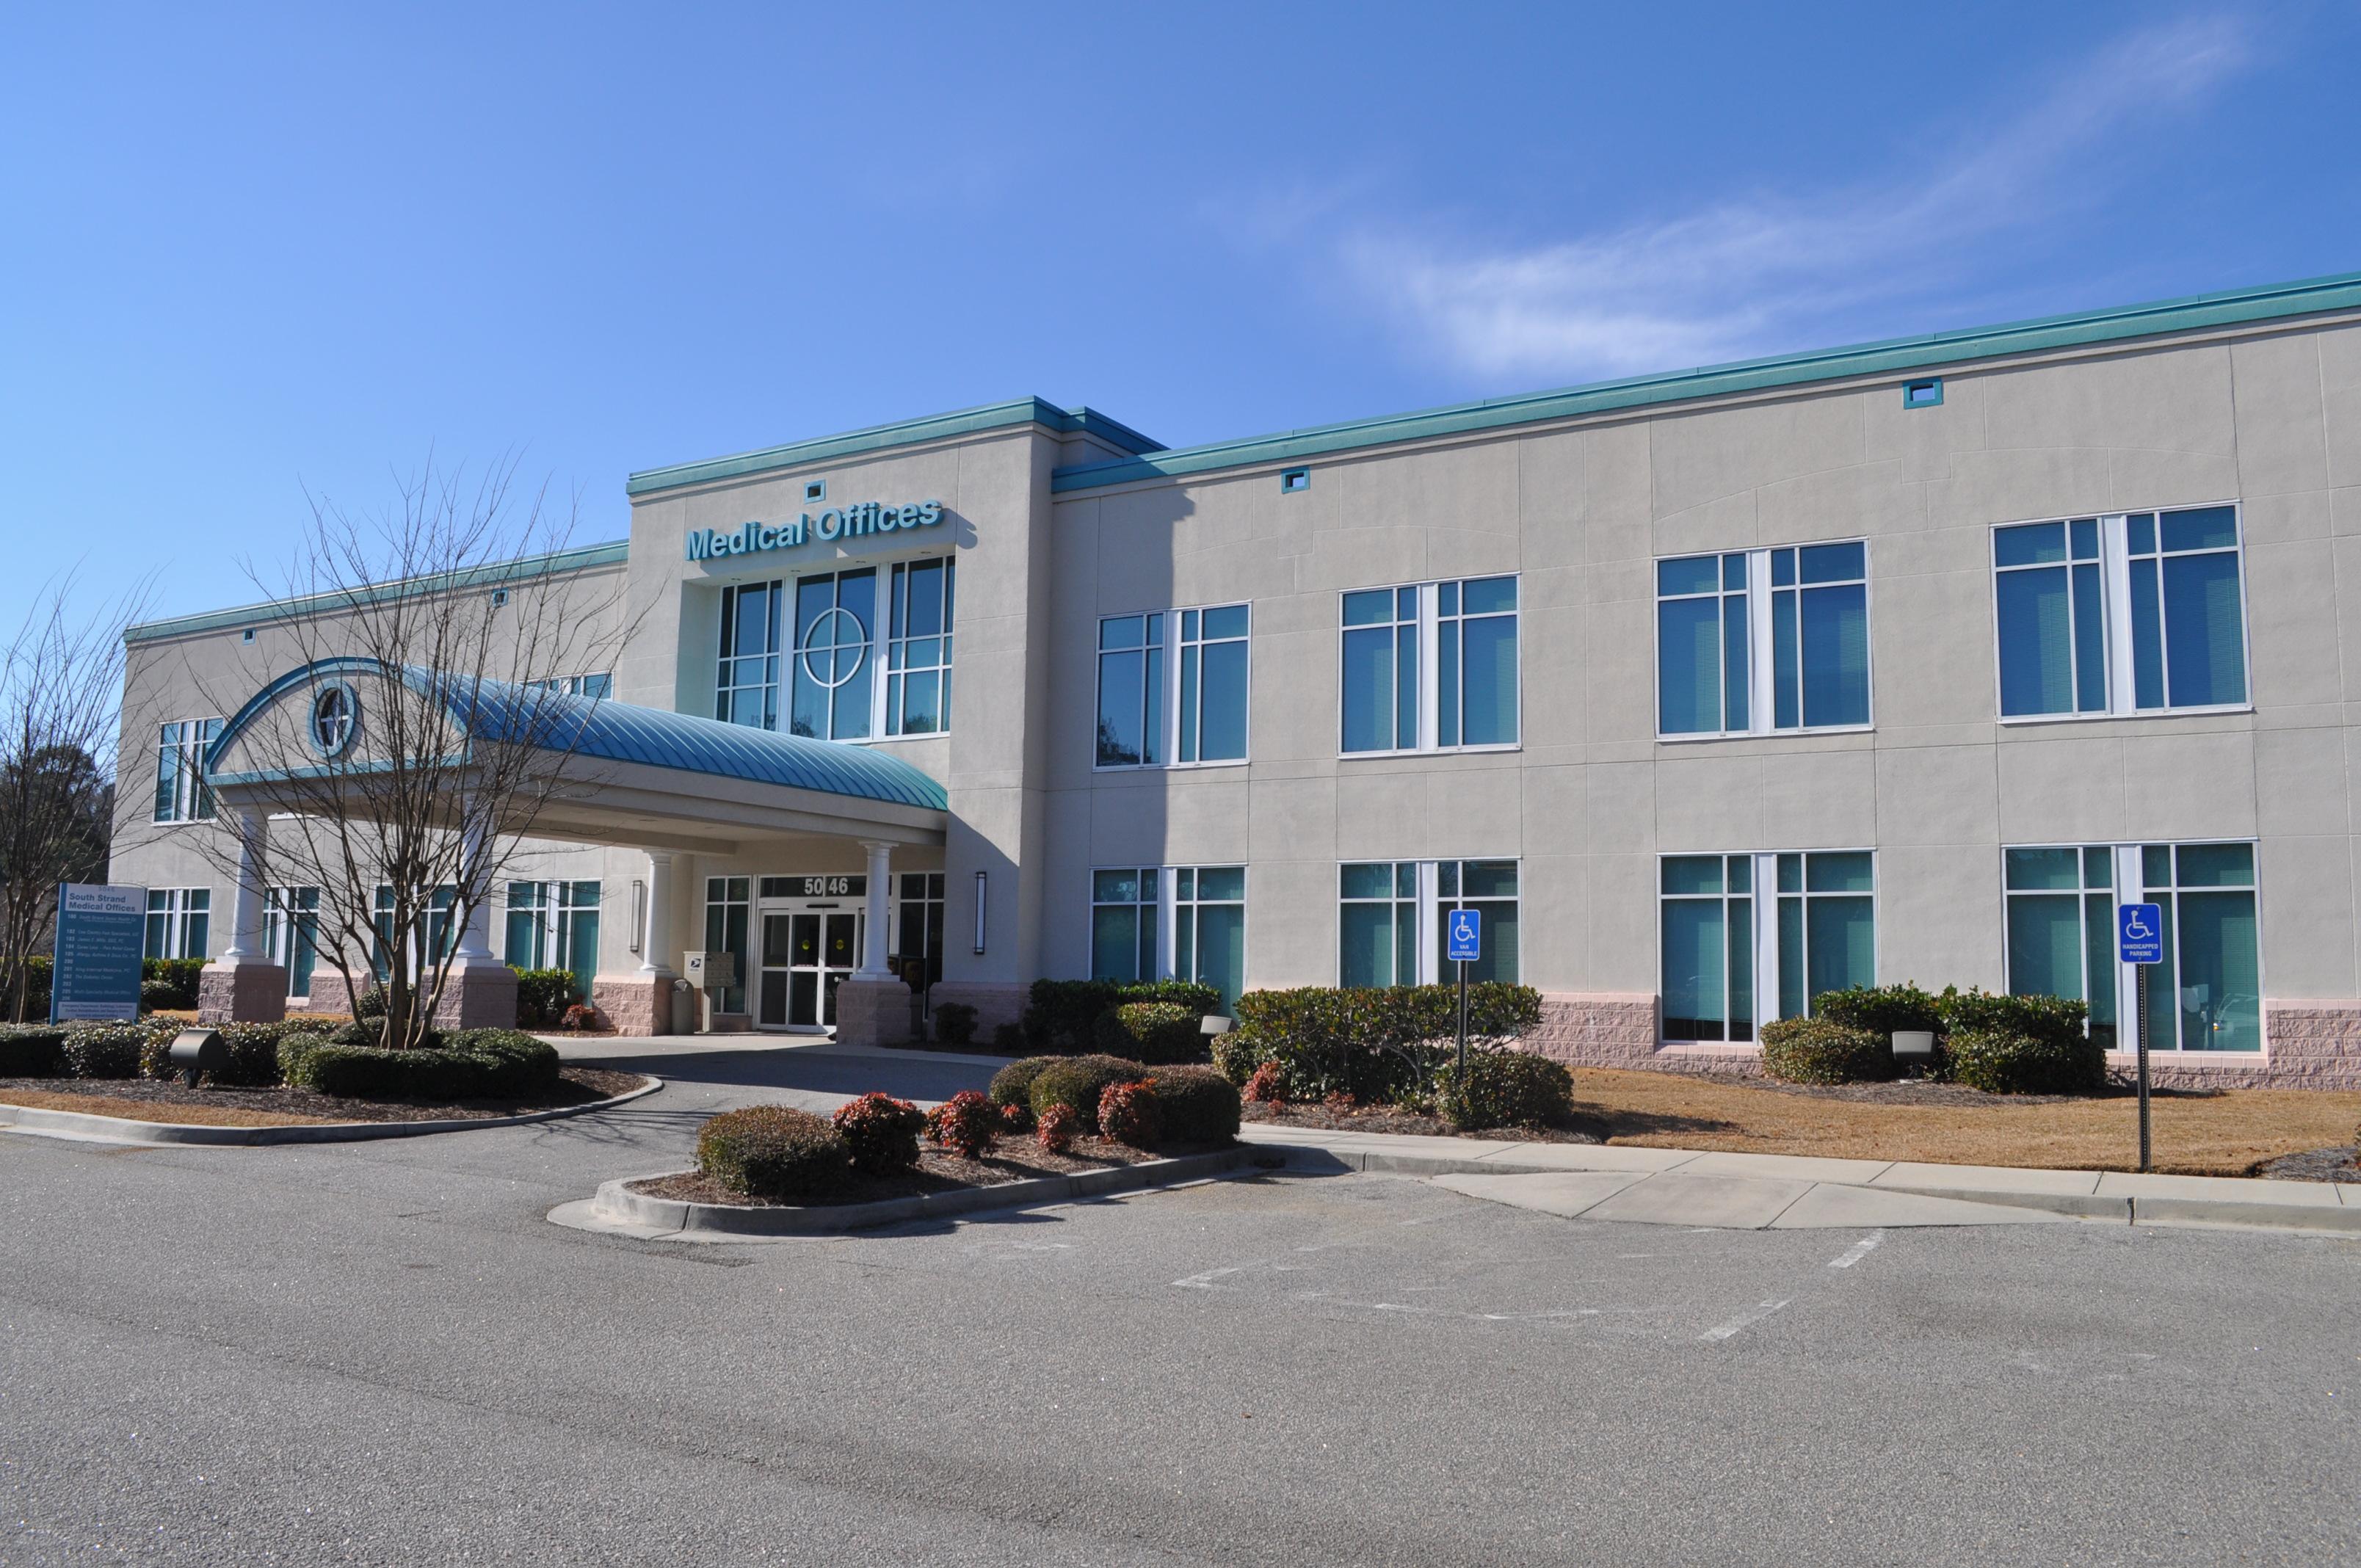 5046 Highway 17 Bypass,Myrtle Beach,South Carolina,29577,Office / Medical,South Strand Medical Offices,Highway 17 Bypass,1379